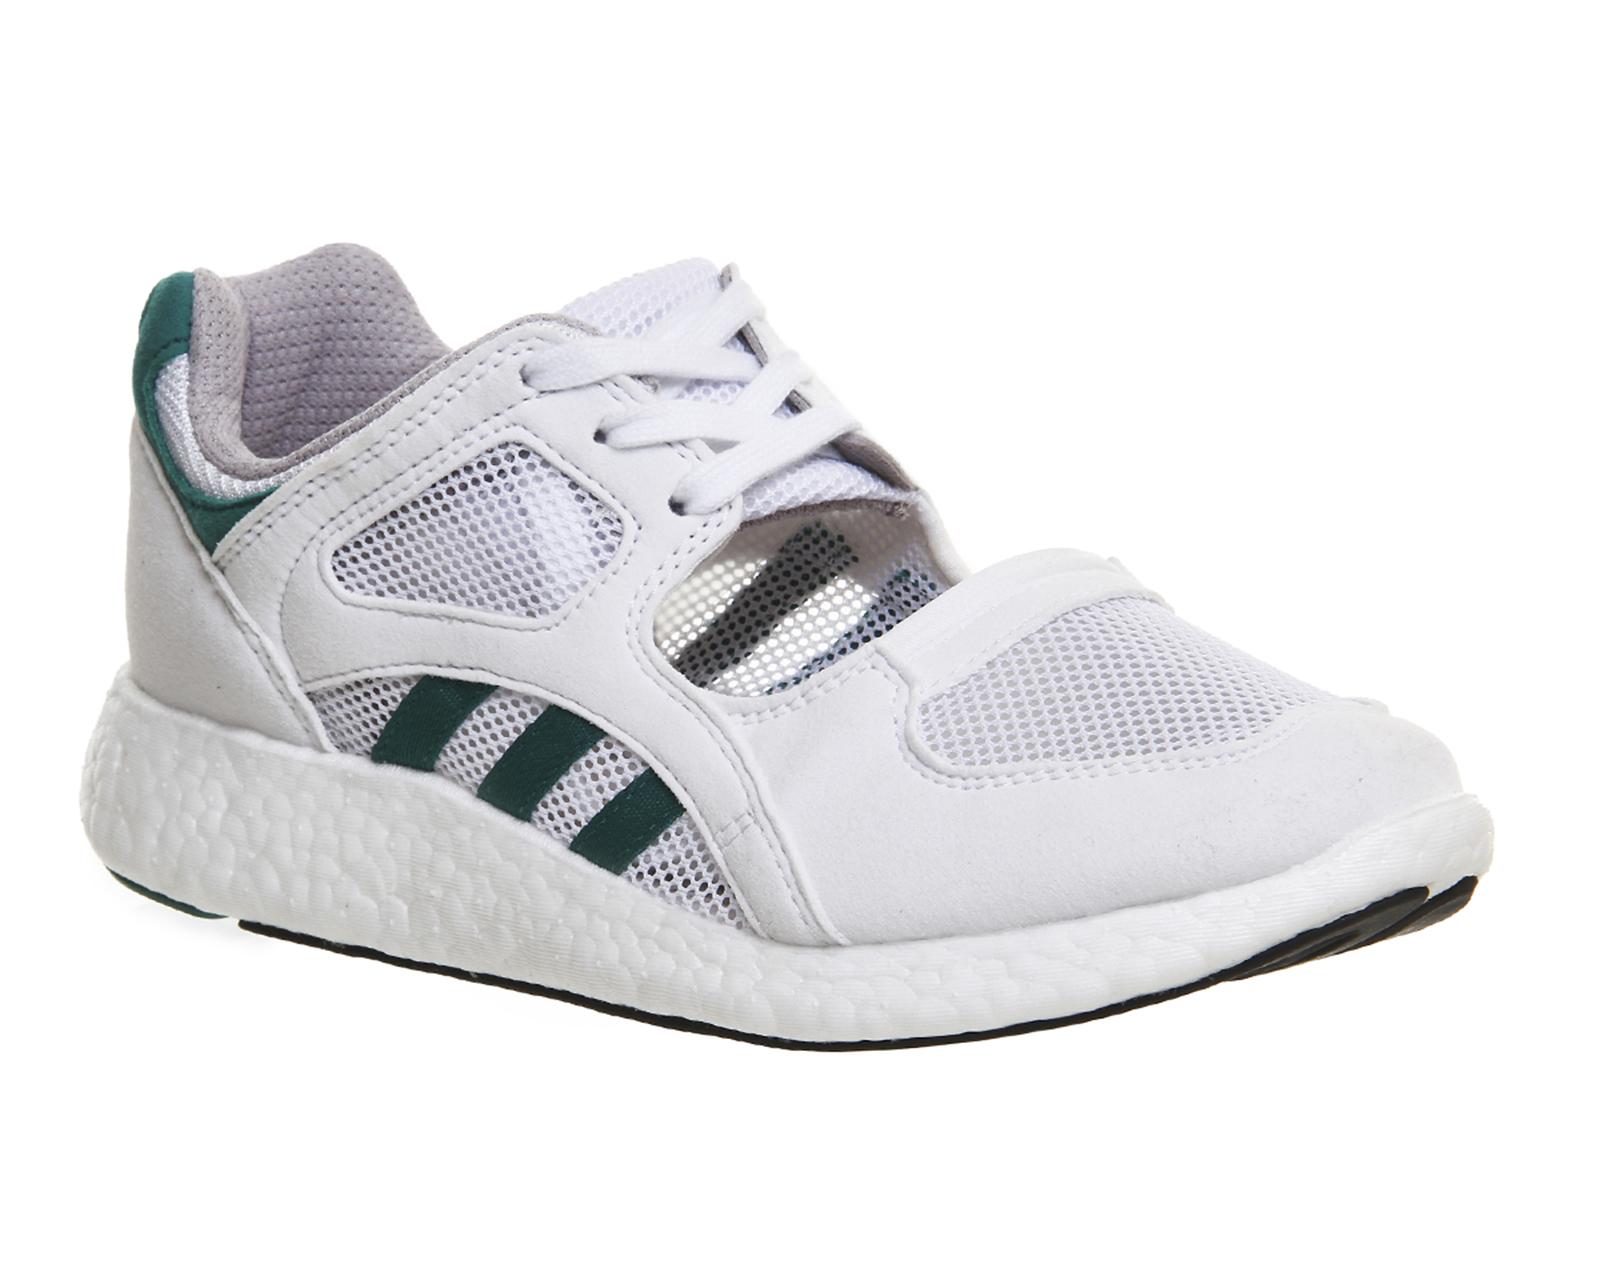 Adidas Equipment Racing Womens Trainers White Sub Green Core Black